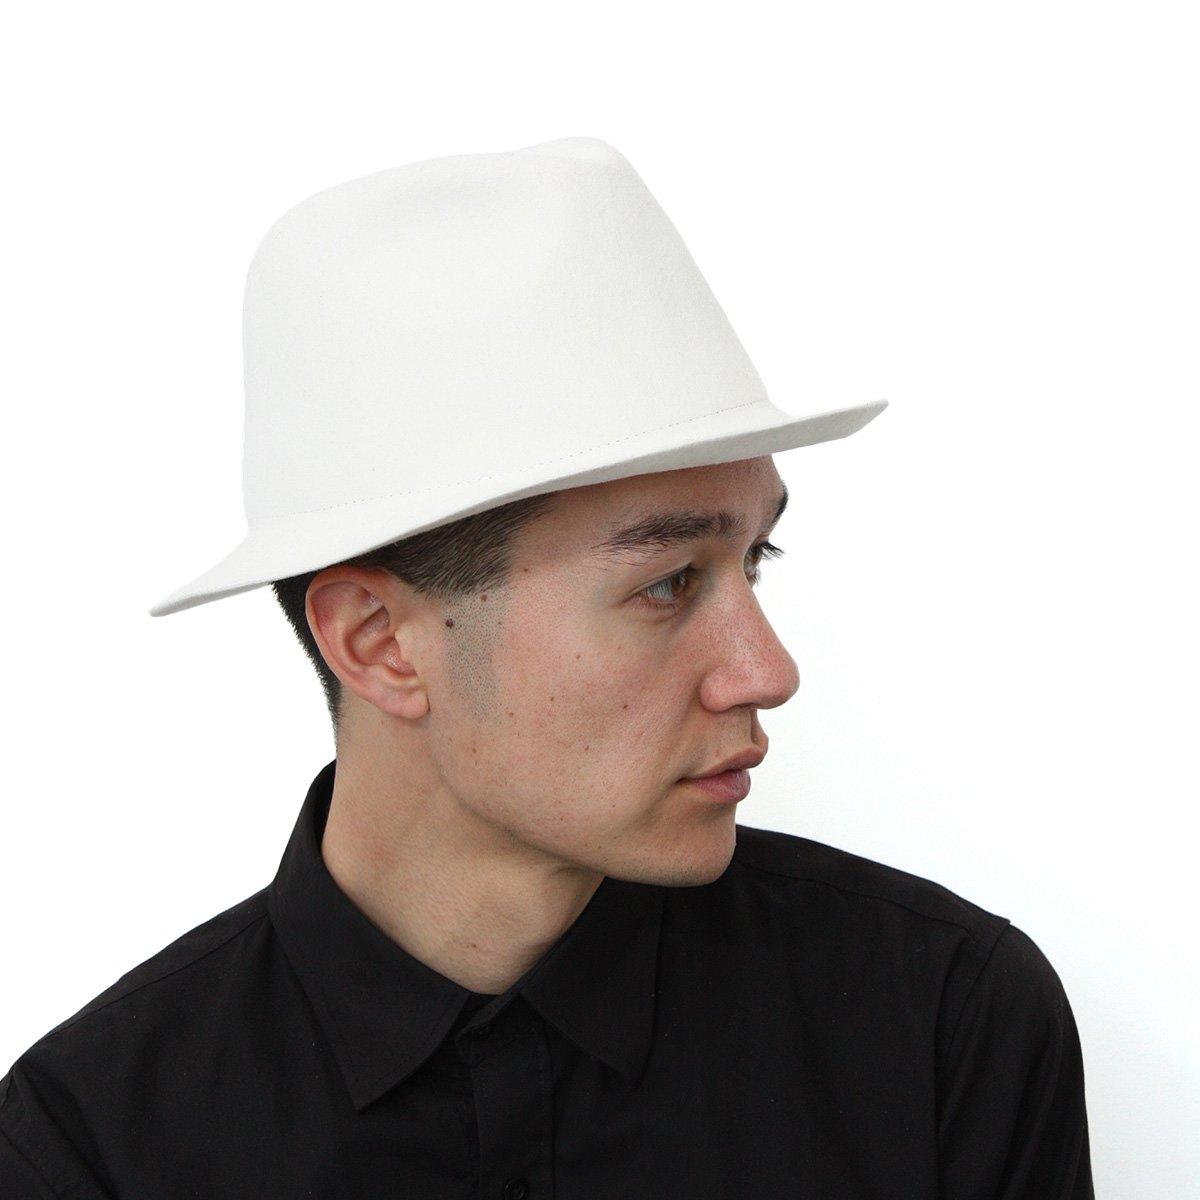 NOMAD FELT HAT SHORT 詳細画像11